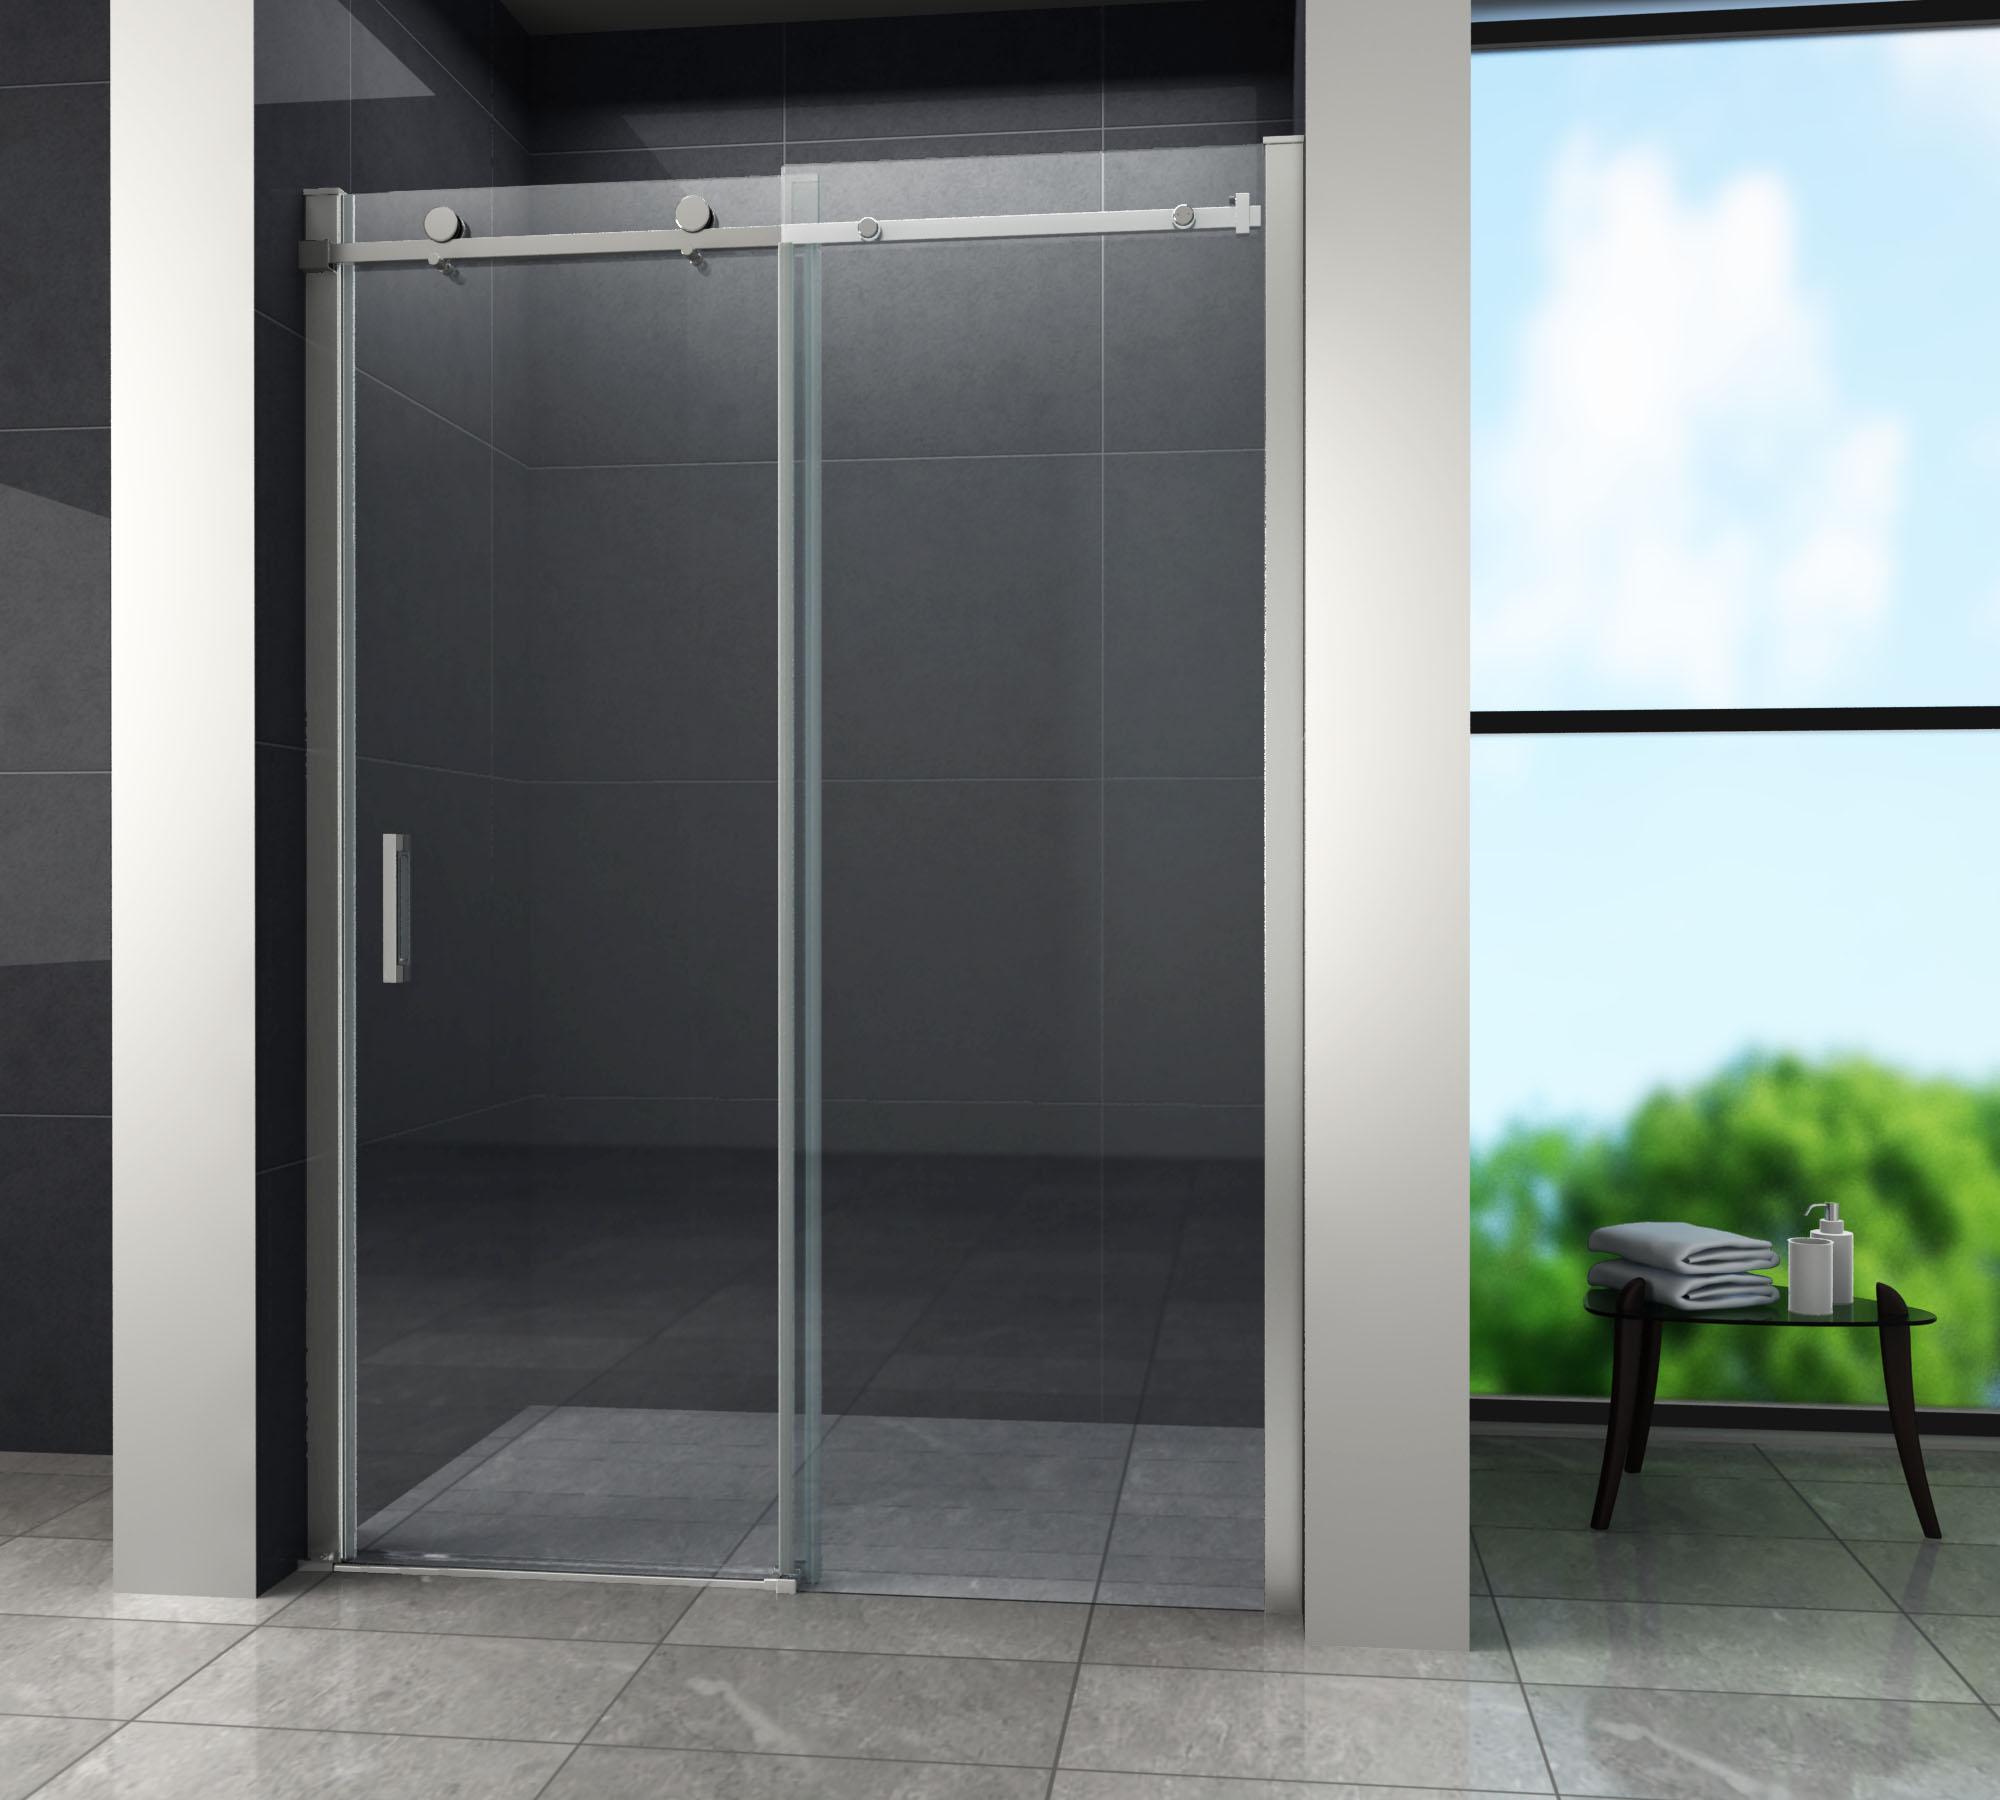 duschkabine bararo 80 x 80 x 195 cm glasdeals. Black Bedroom Furniture Sets. Home Design Ideas